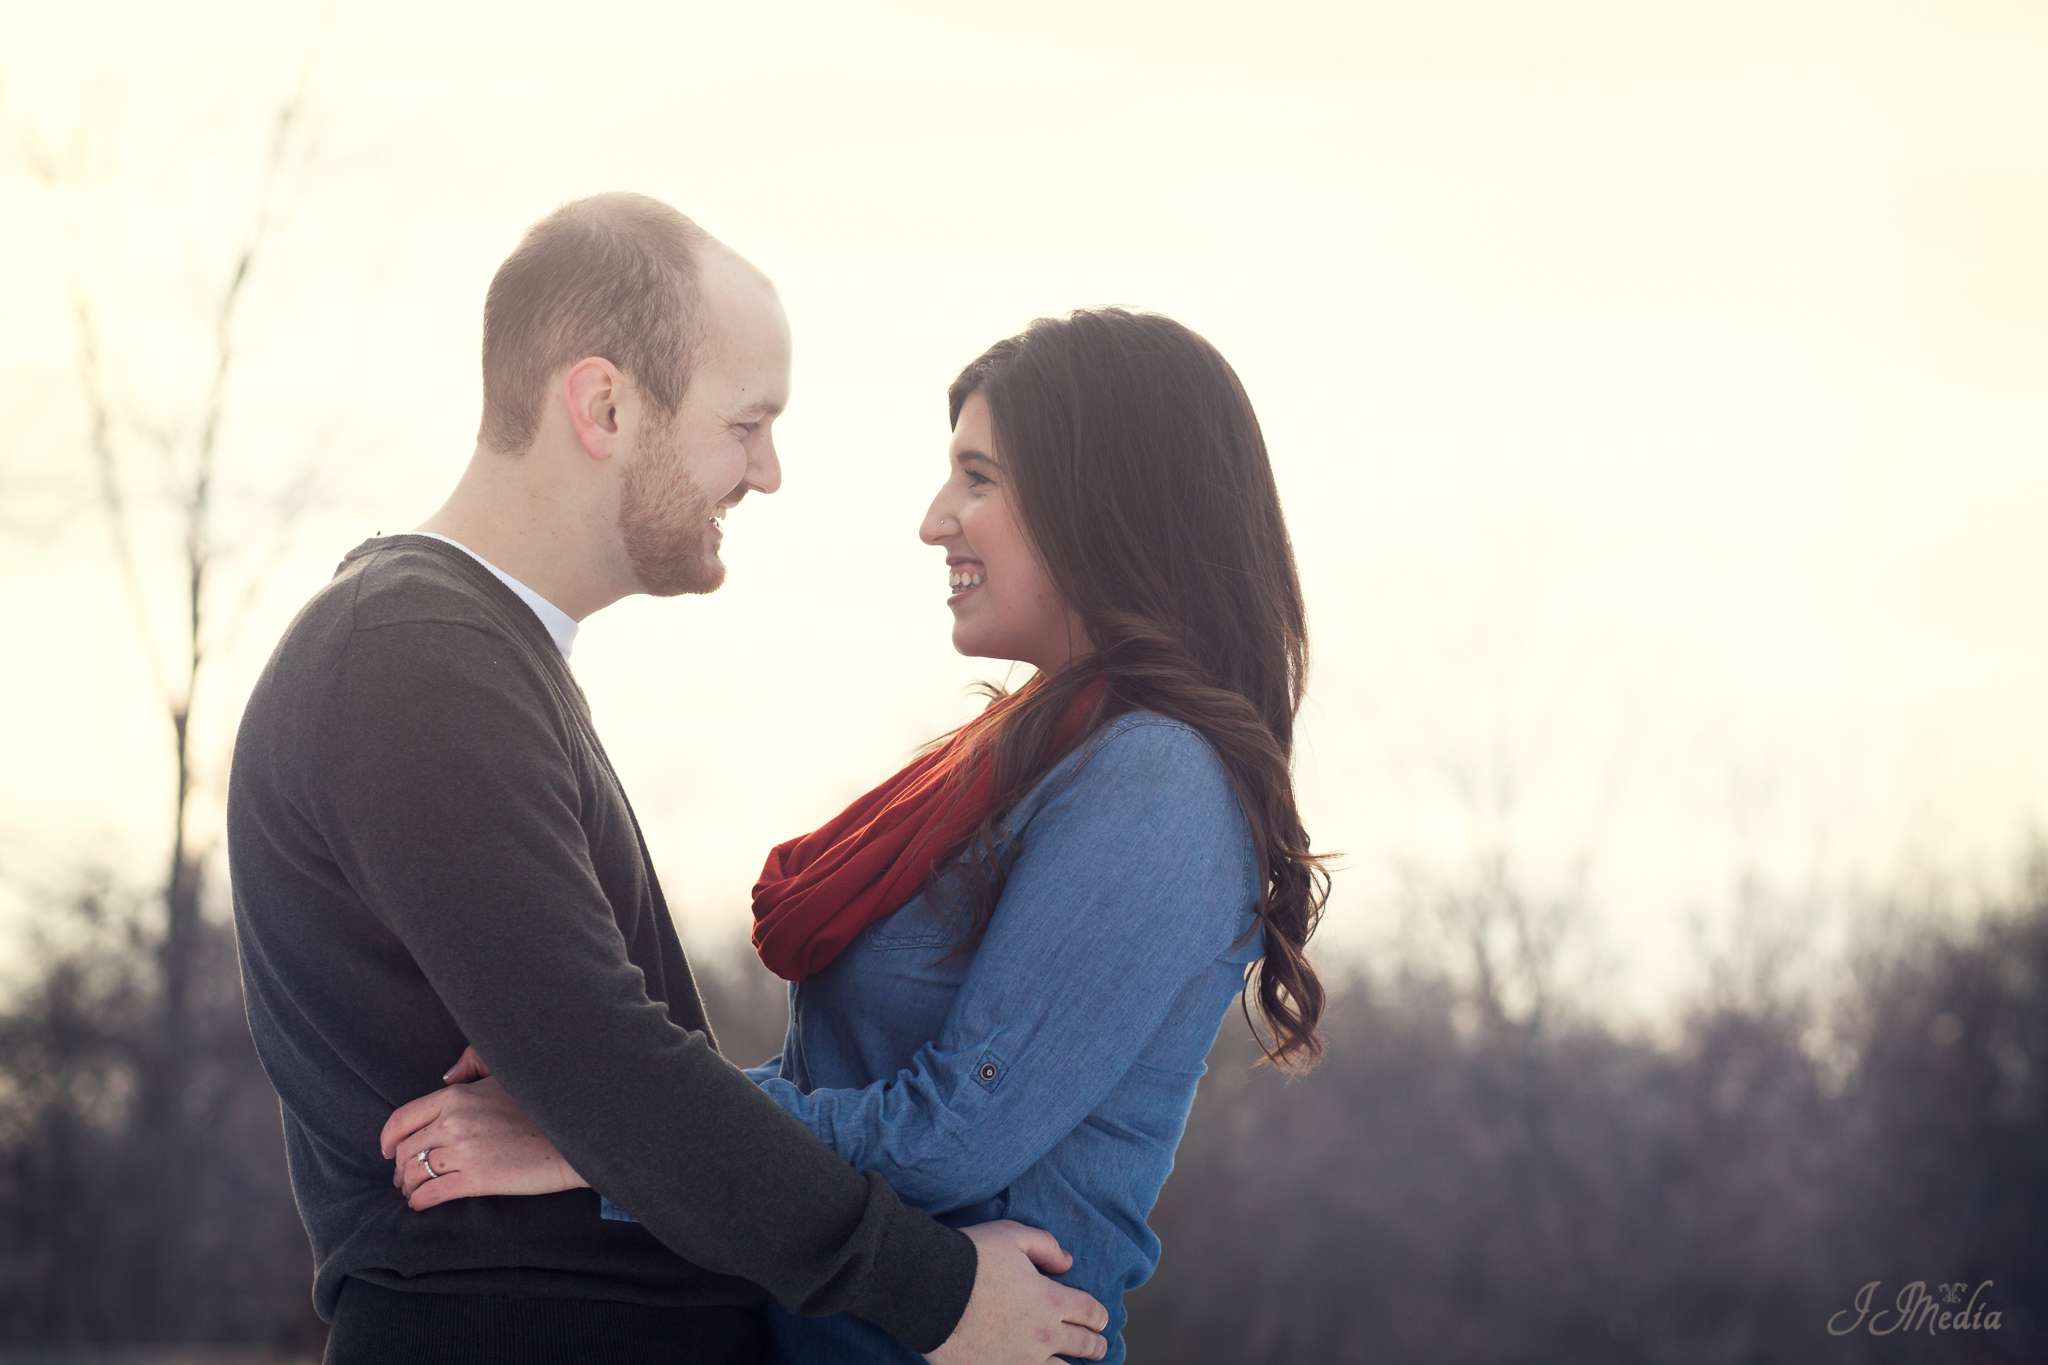 Winter-Engagement-Photos-JJMedia-4